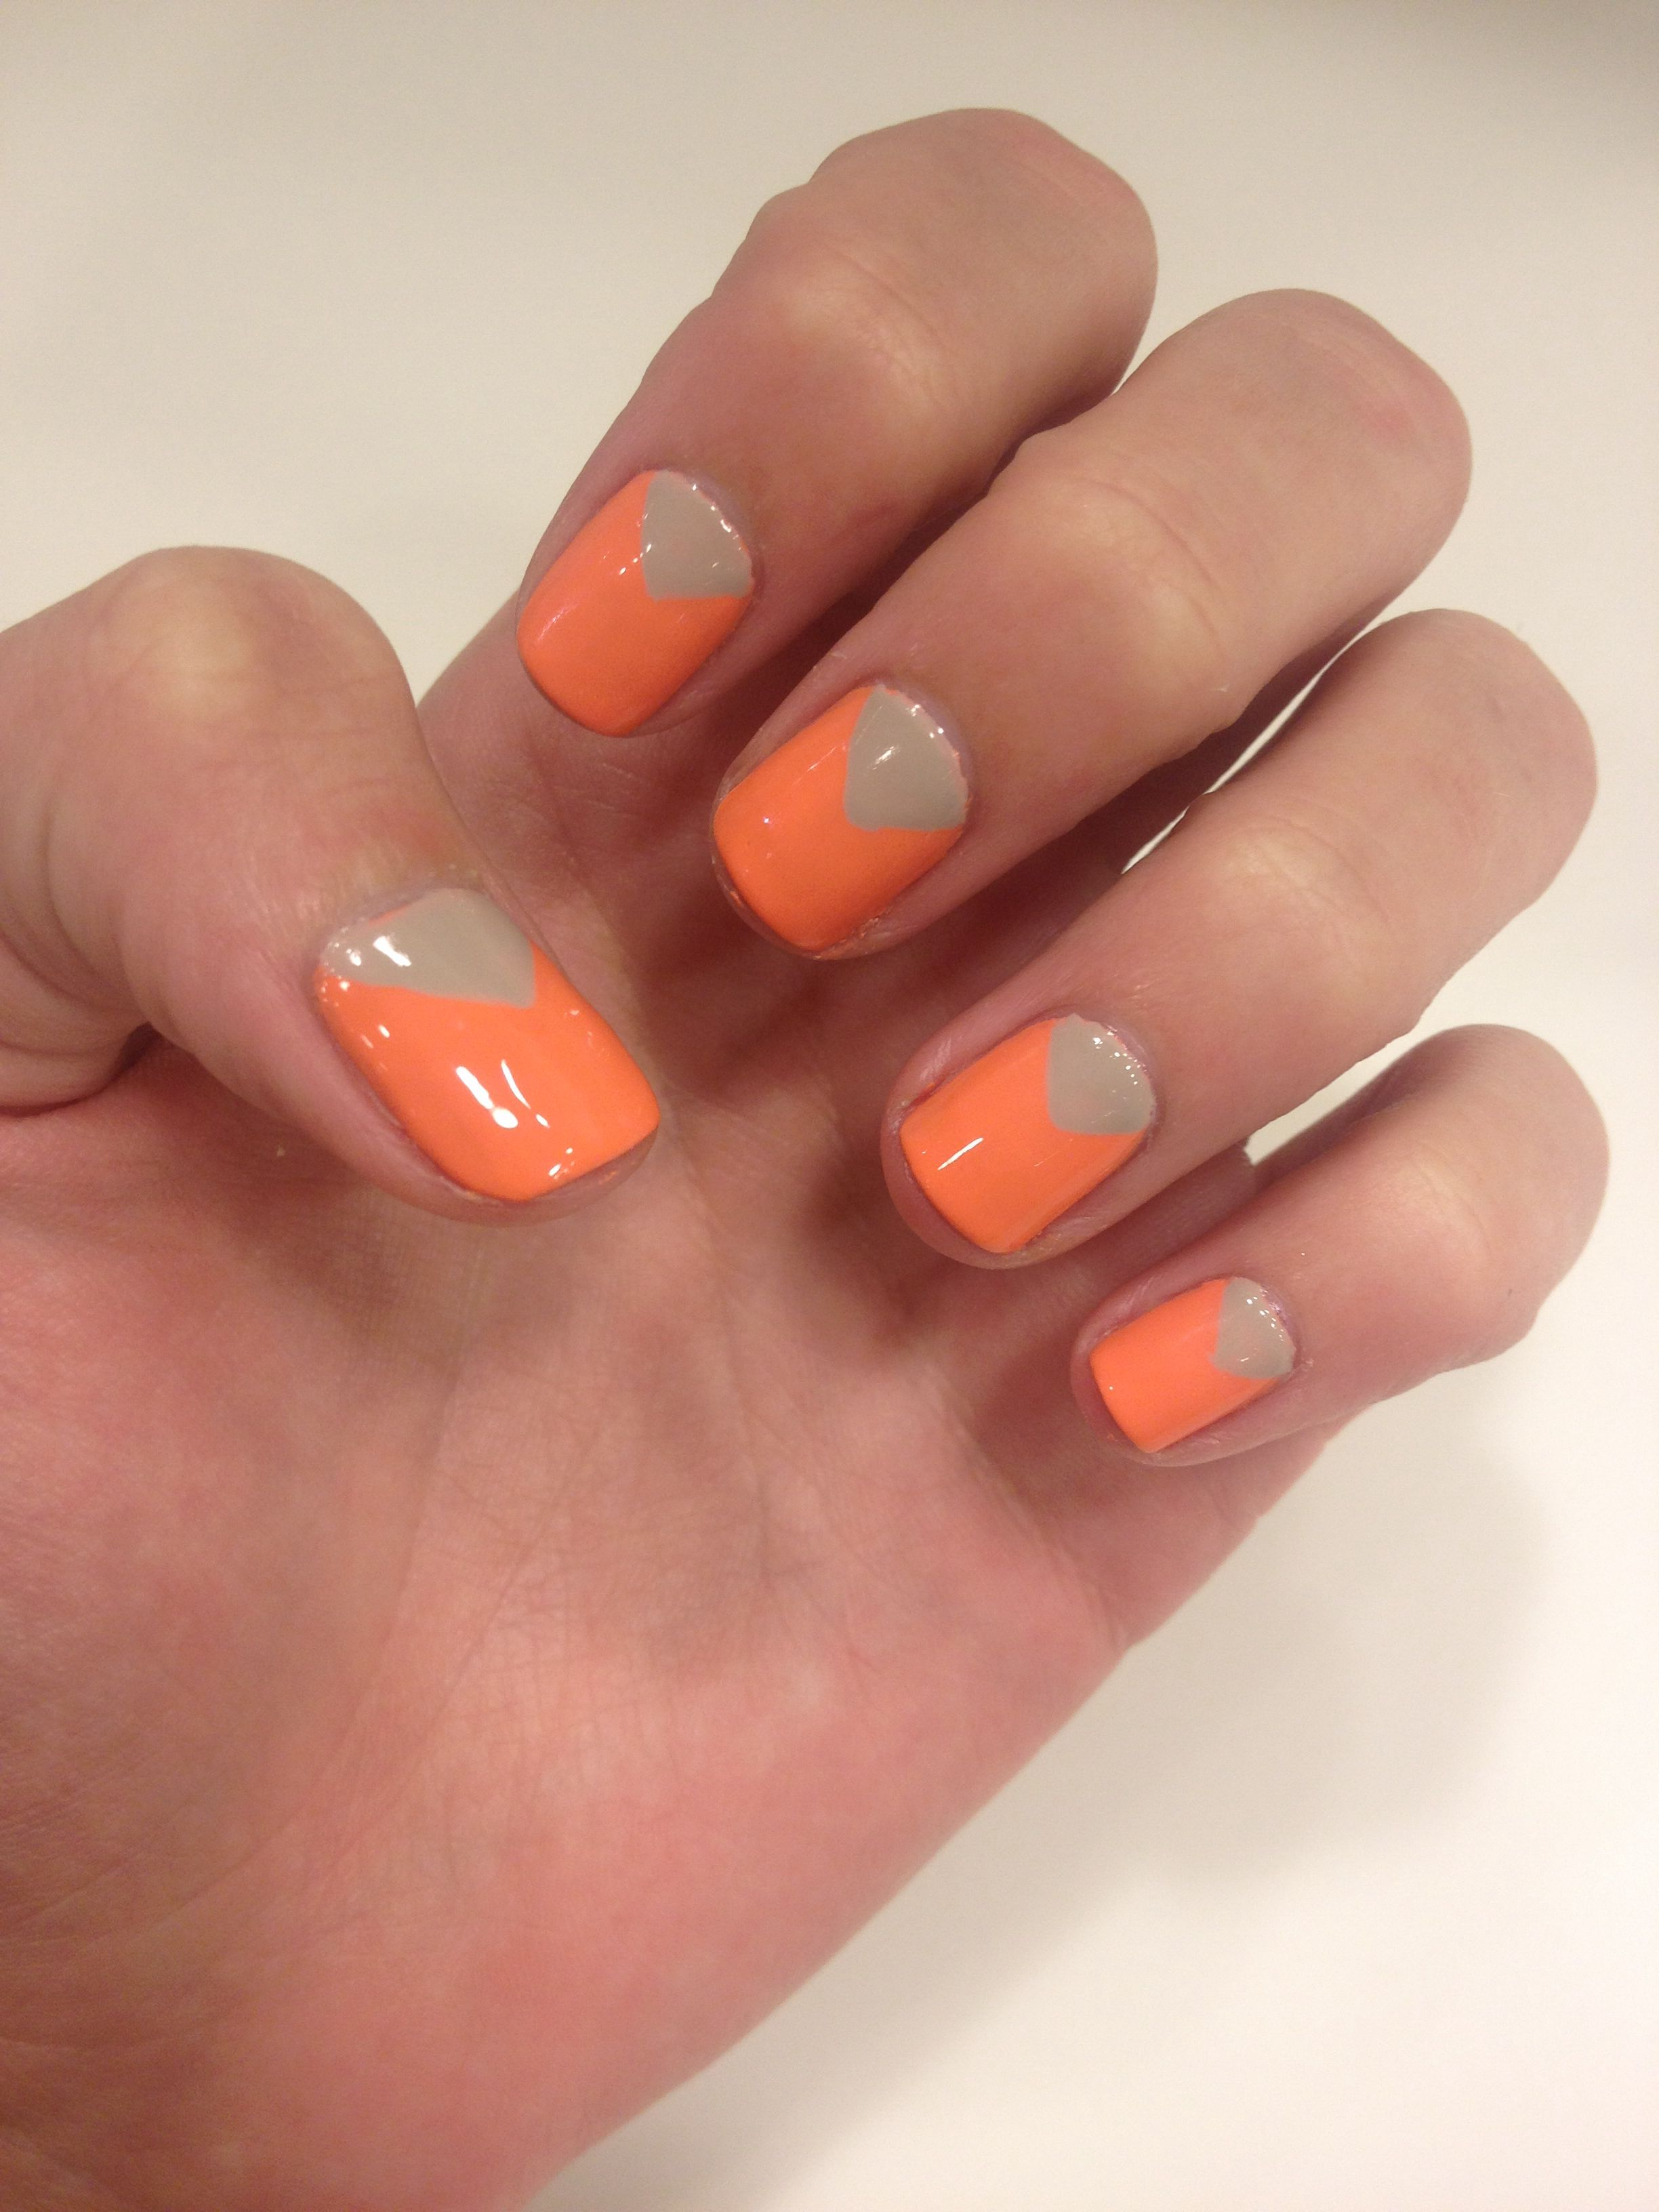 My geometric nails